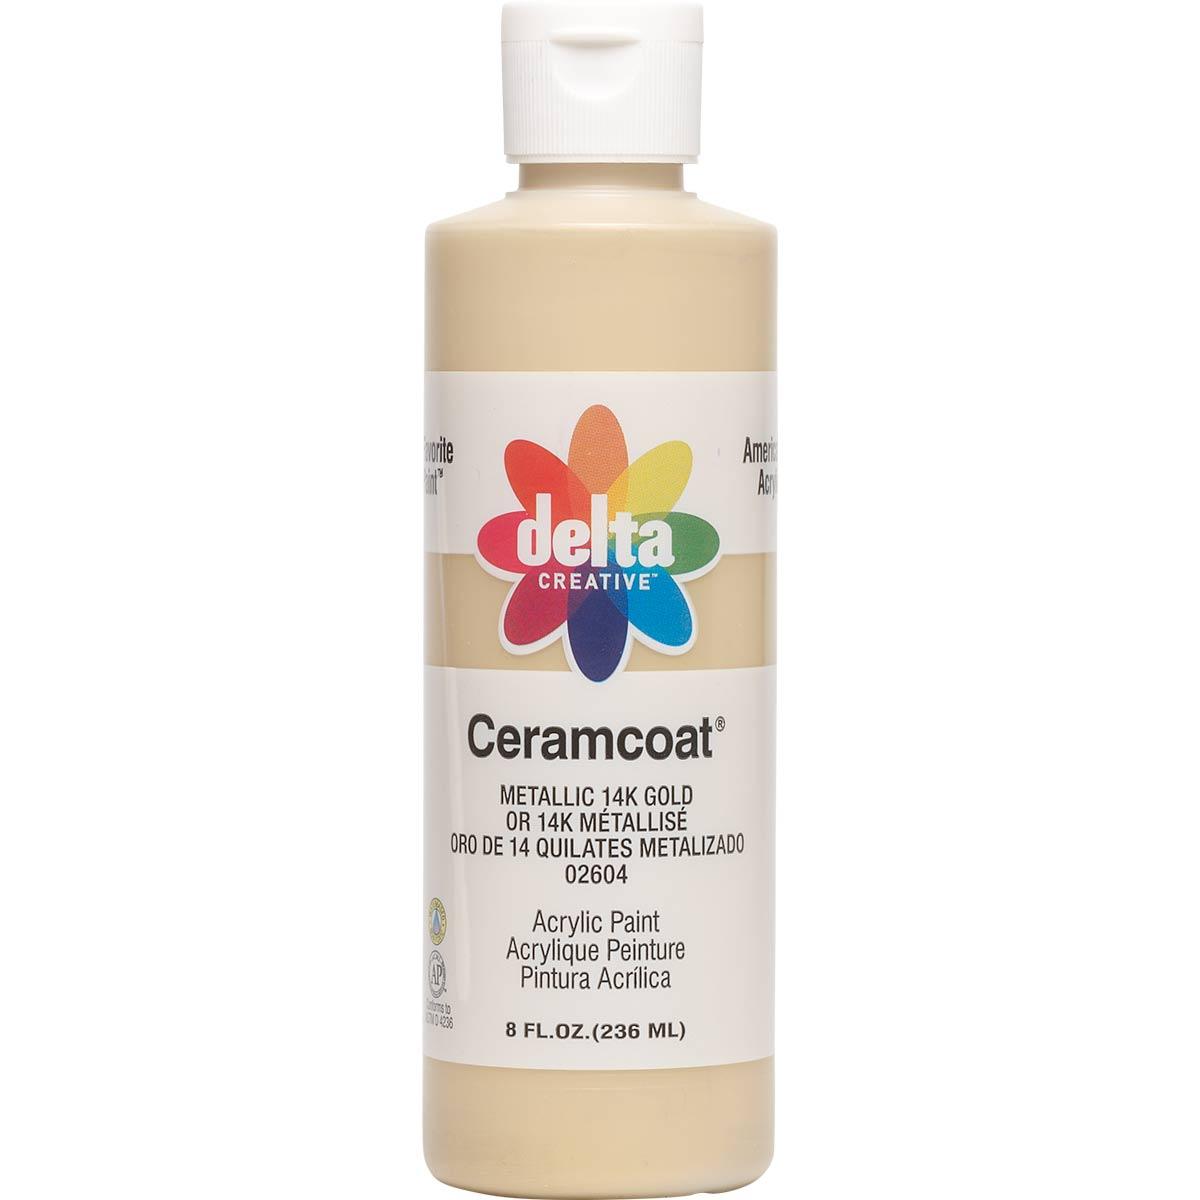 Delta Ceramcoat ® Acrylic Paint - Metallic 14K Gold, 8 oz.